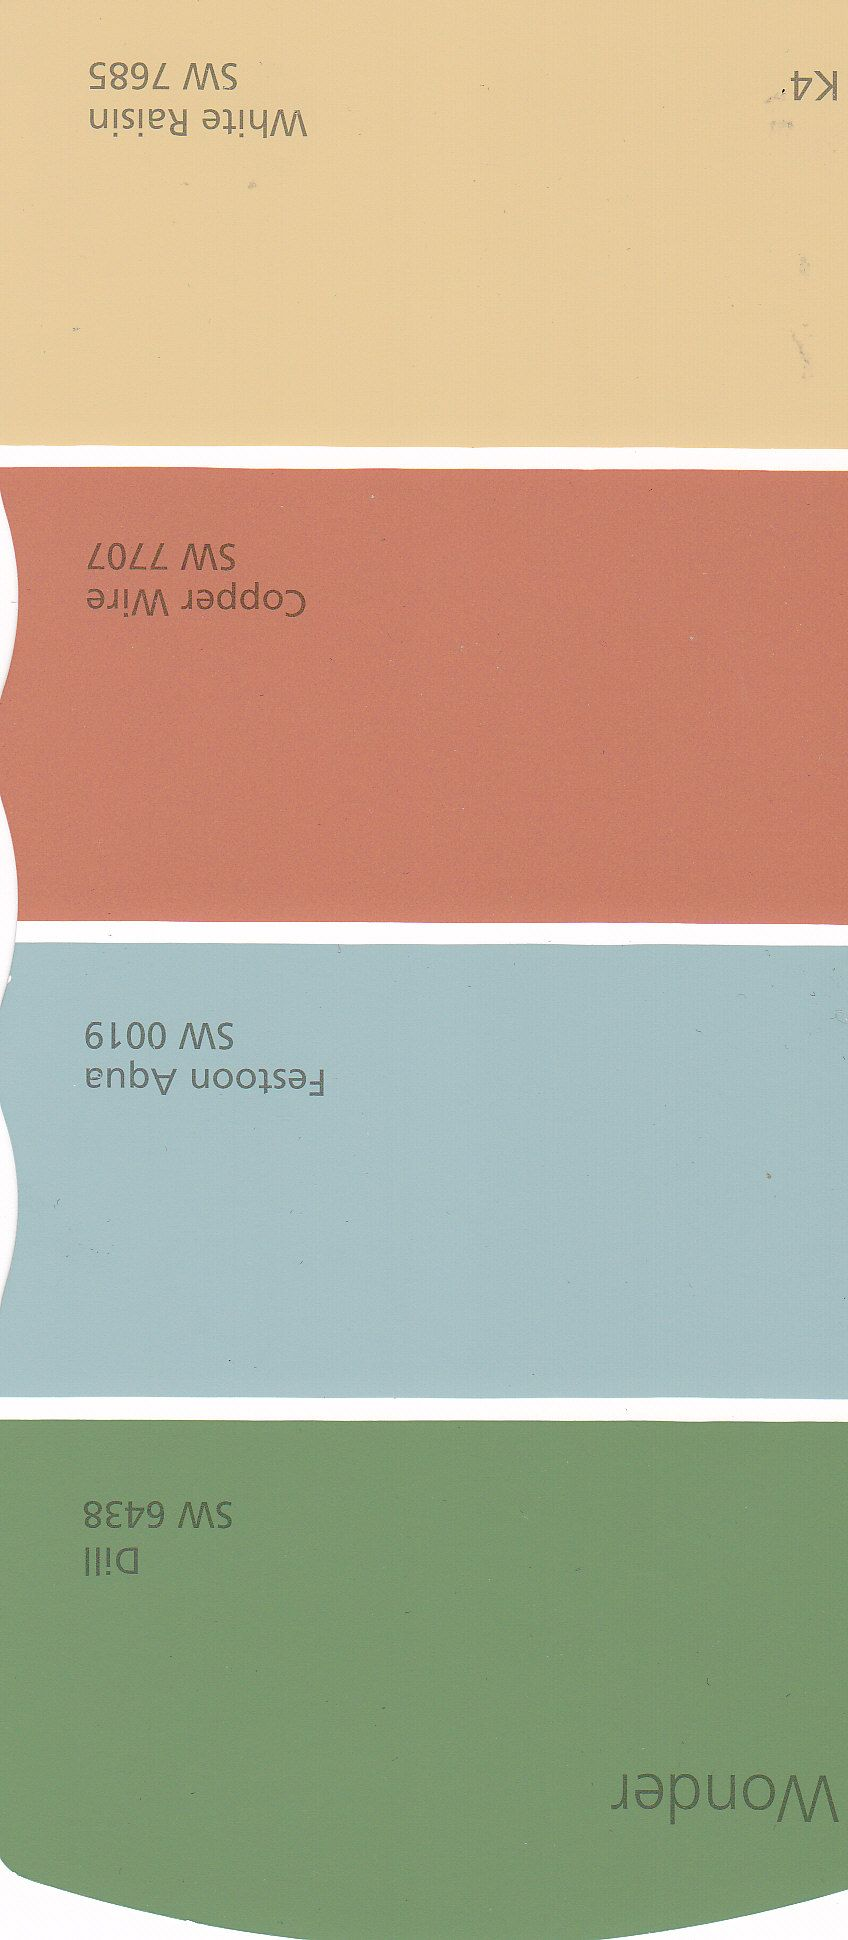 Sherwin williams color palette 2017 grasscloth wallpaper - Sherwin williams exterior paint colors 2017 ...